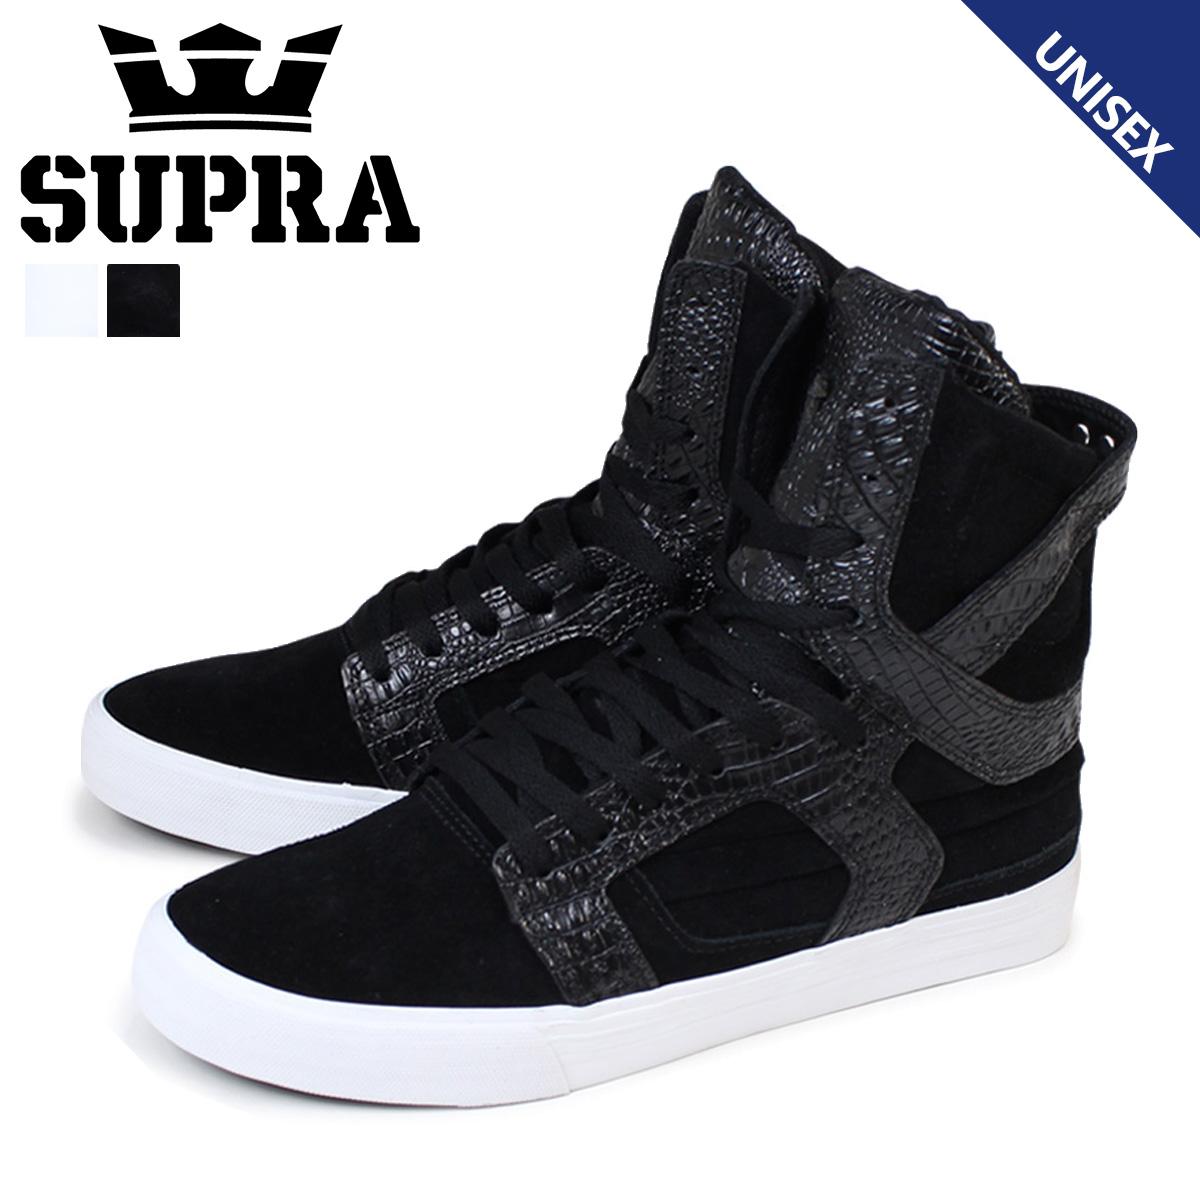 91dacef2b5f Surpra sky top SUPRA men gap Dis sneakers SKYTOP II S01031 S01054 shoes  white black ...